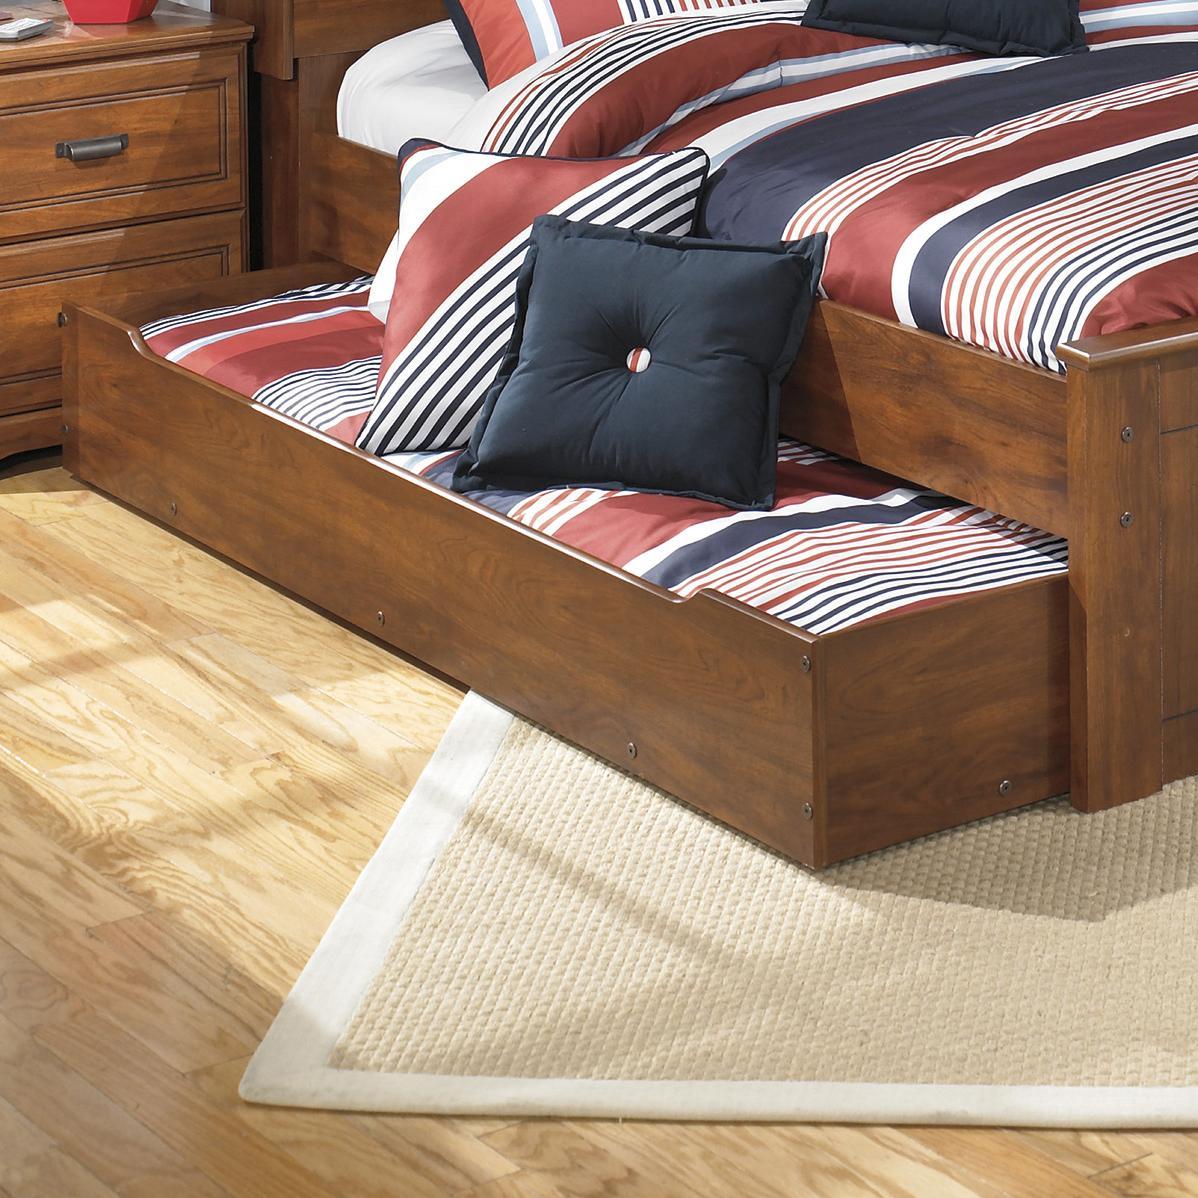 ashley signature design barchan full panel bed with trundle under bed storage unit johnny. Black Bedroom Furniture Sets. Home Design Ideas